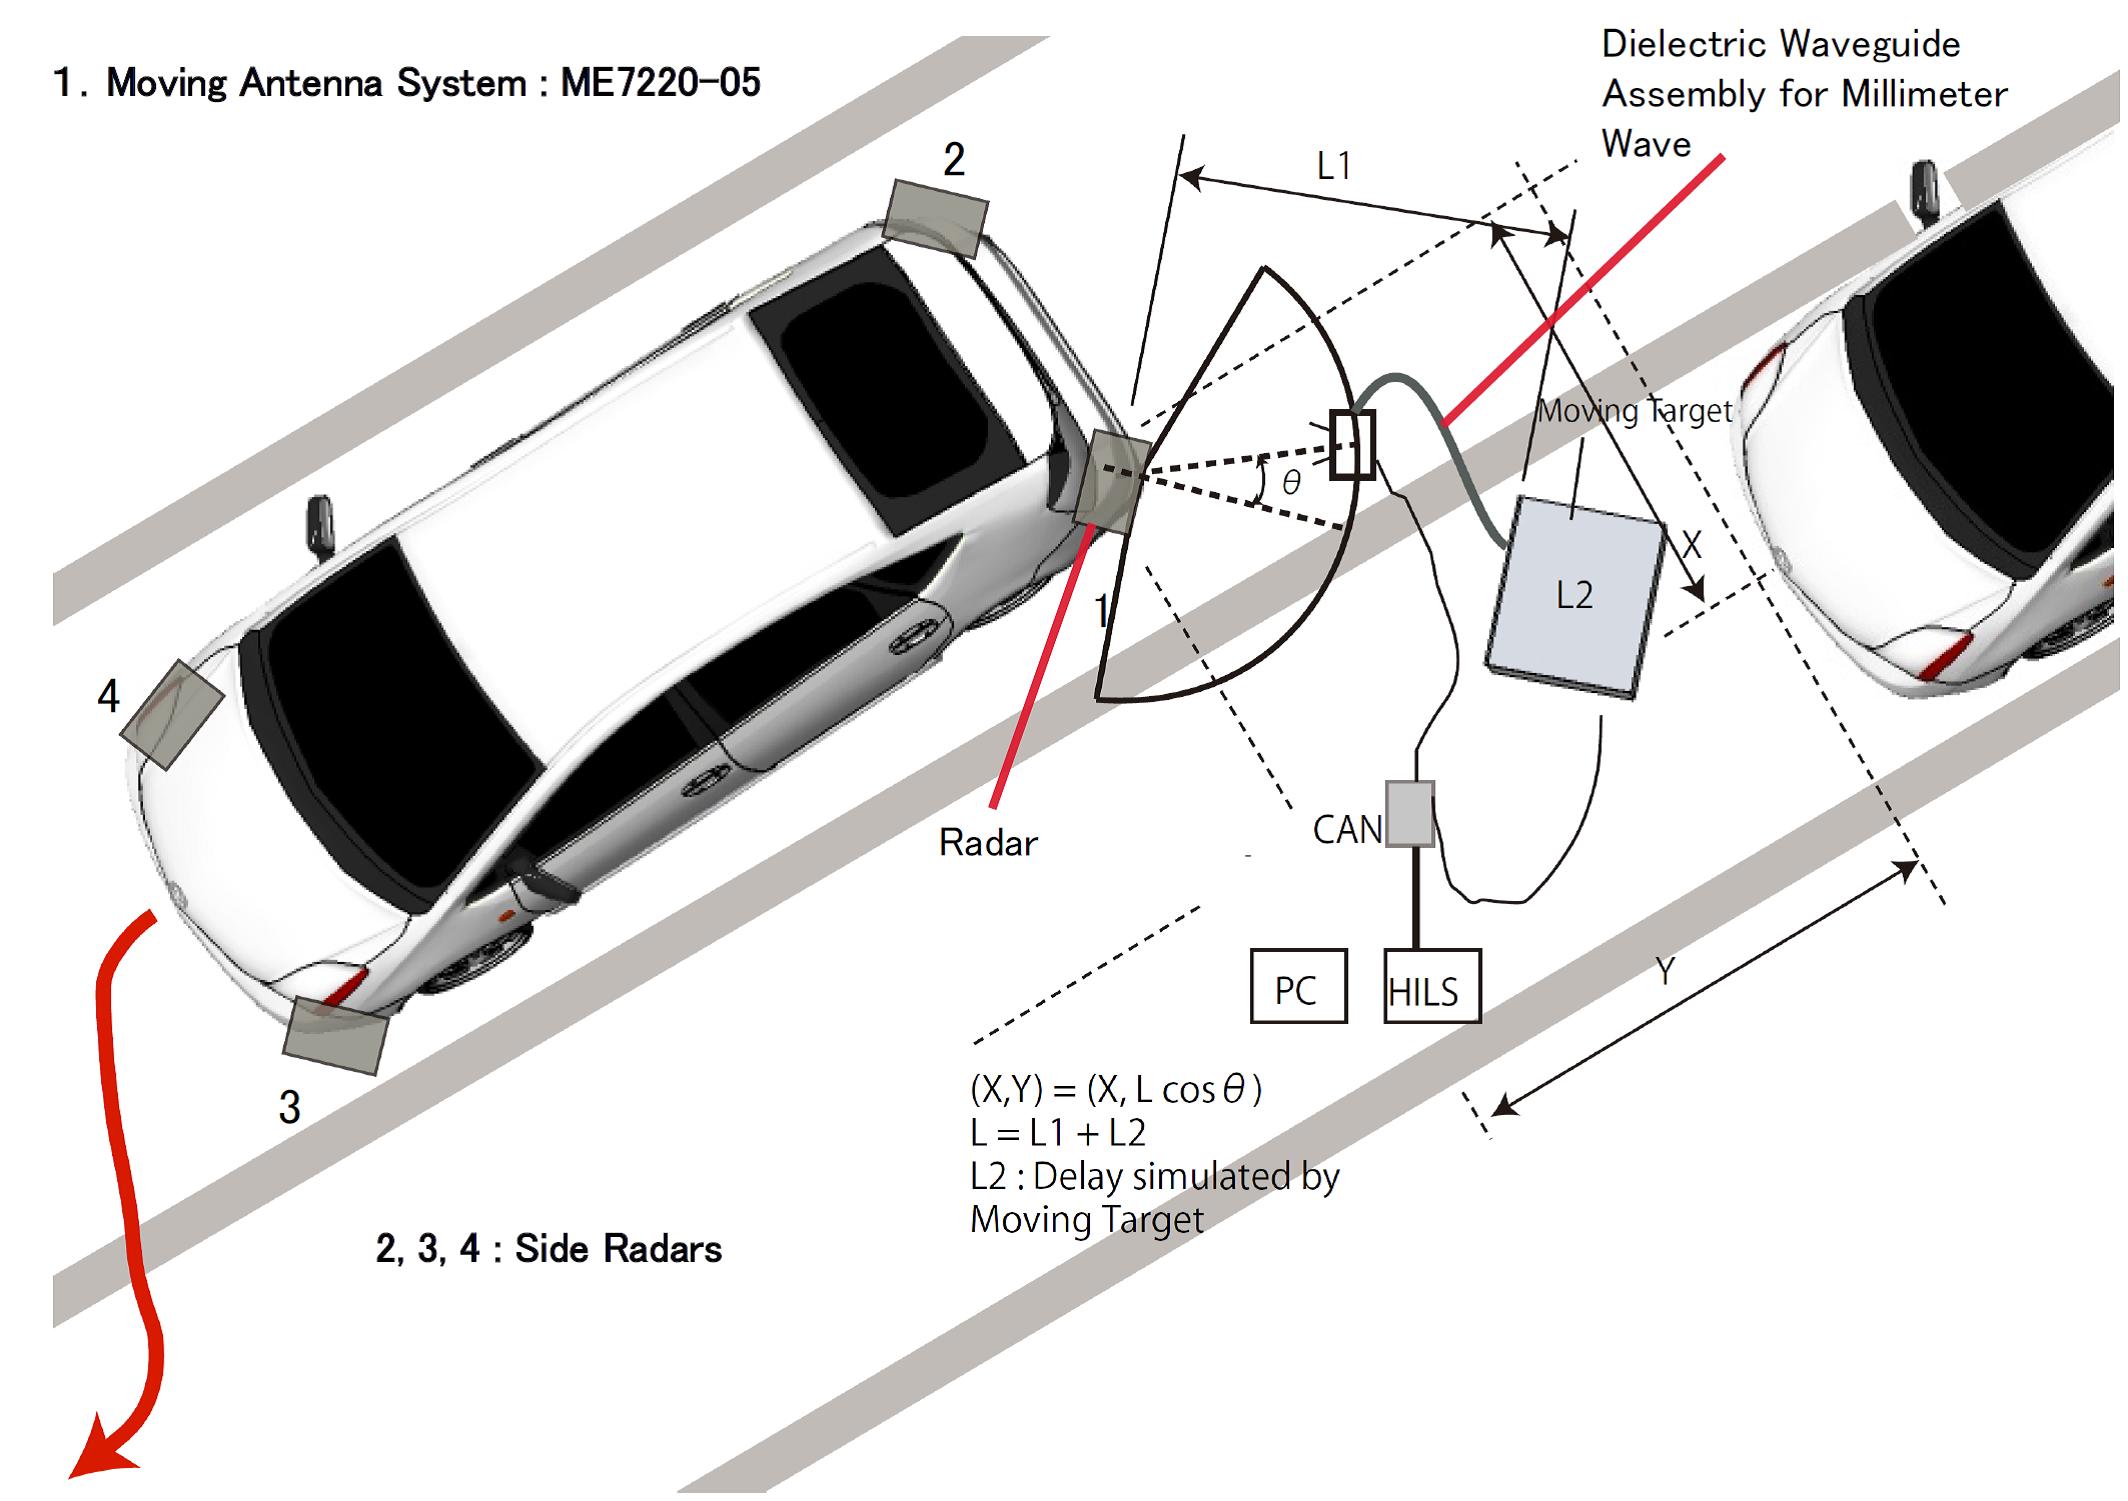 Radar Evaluation & Measurement Systems